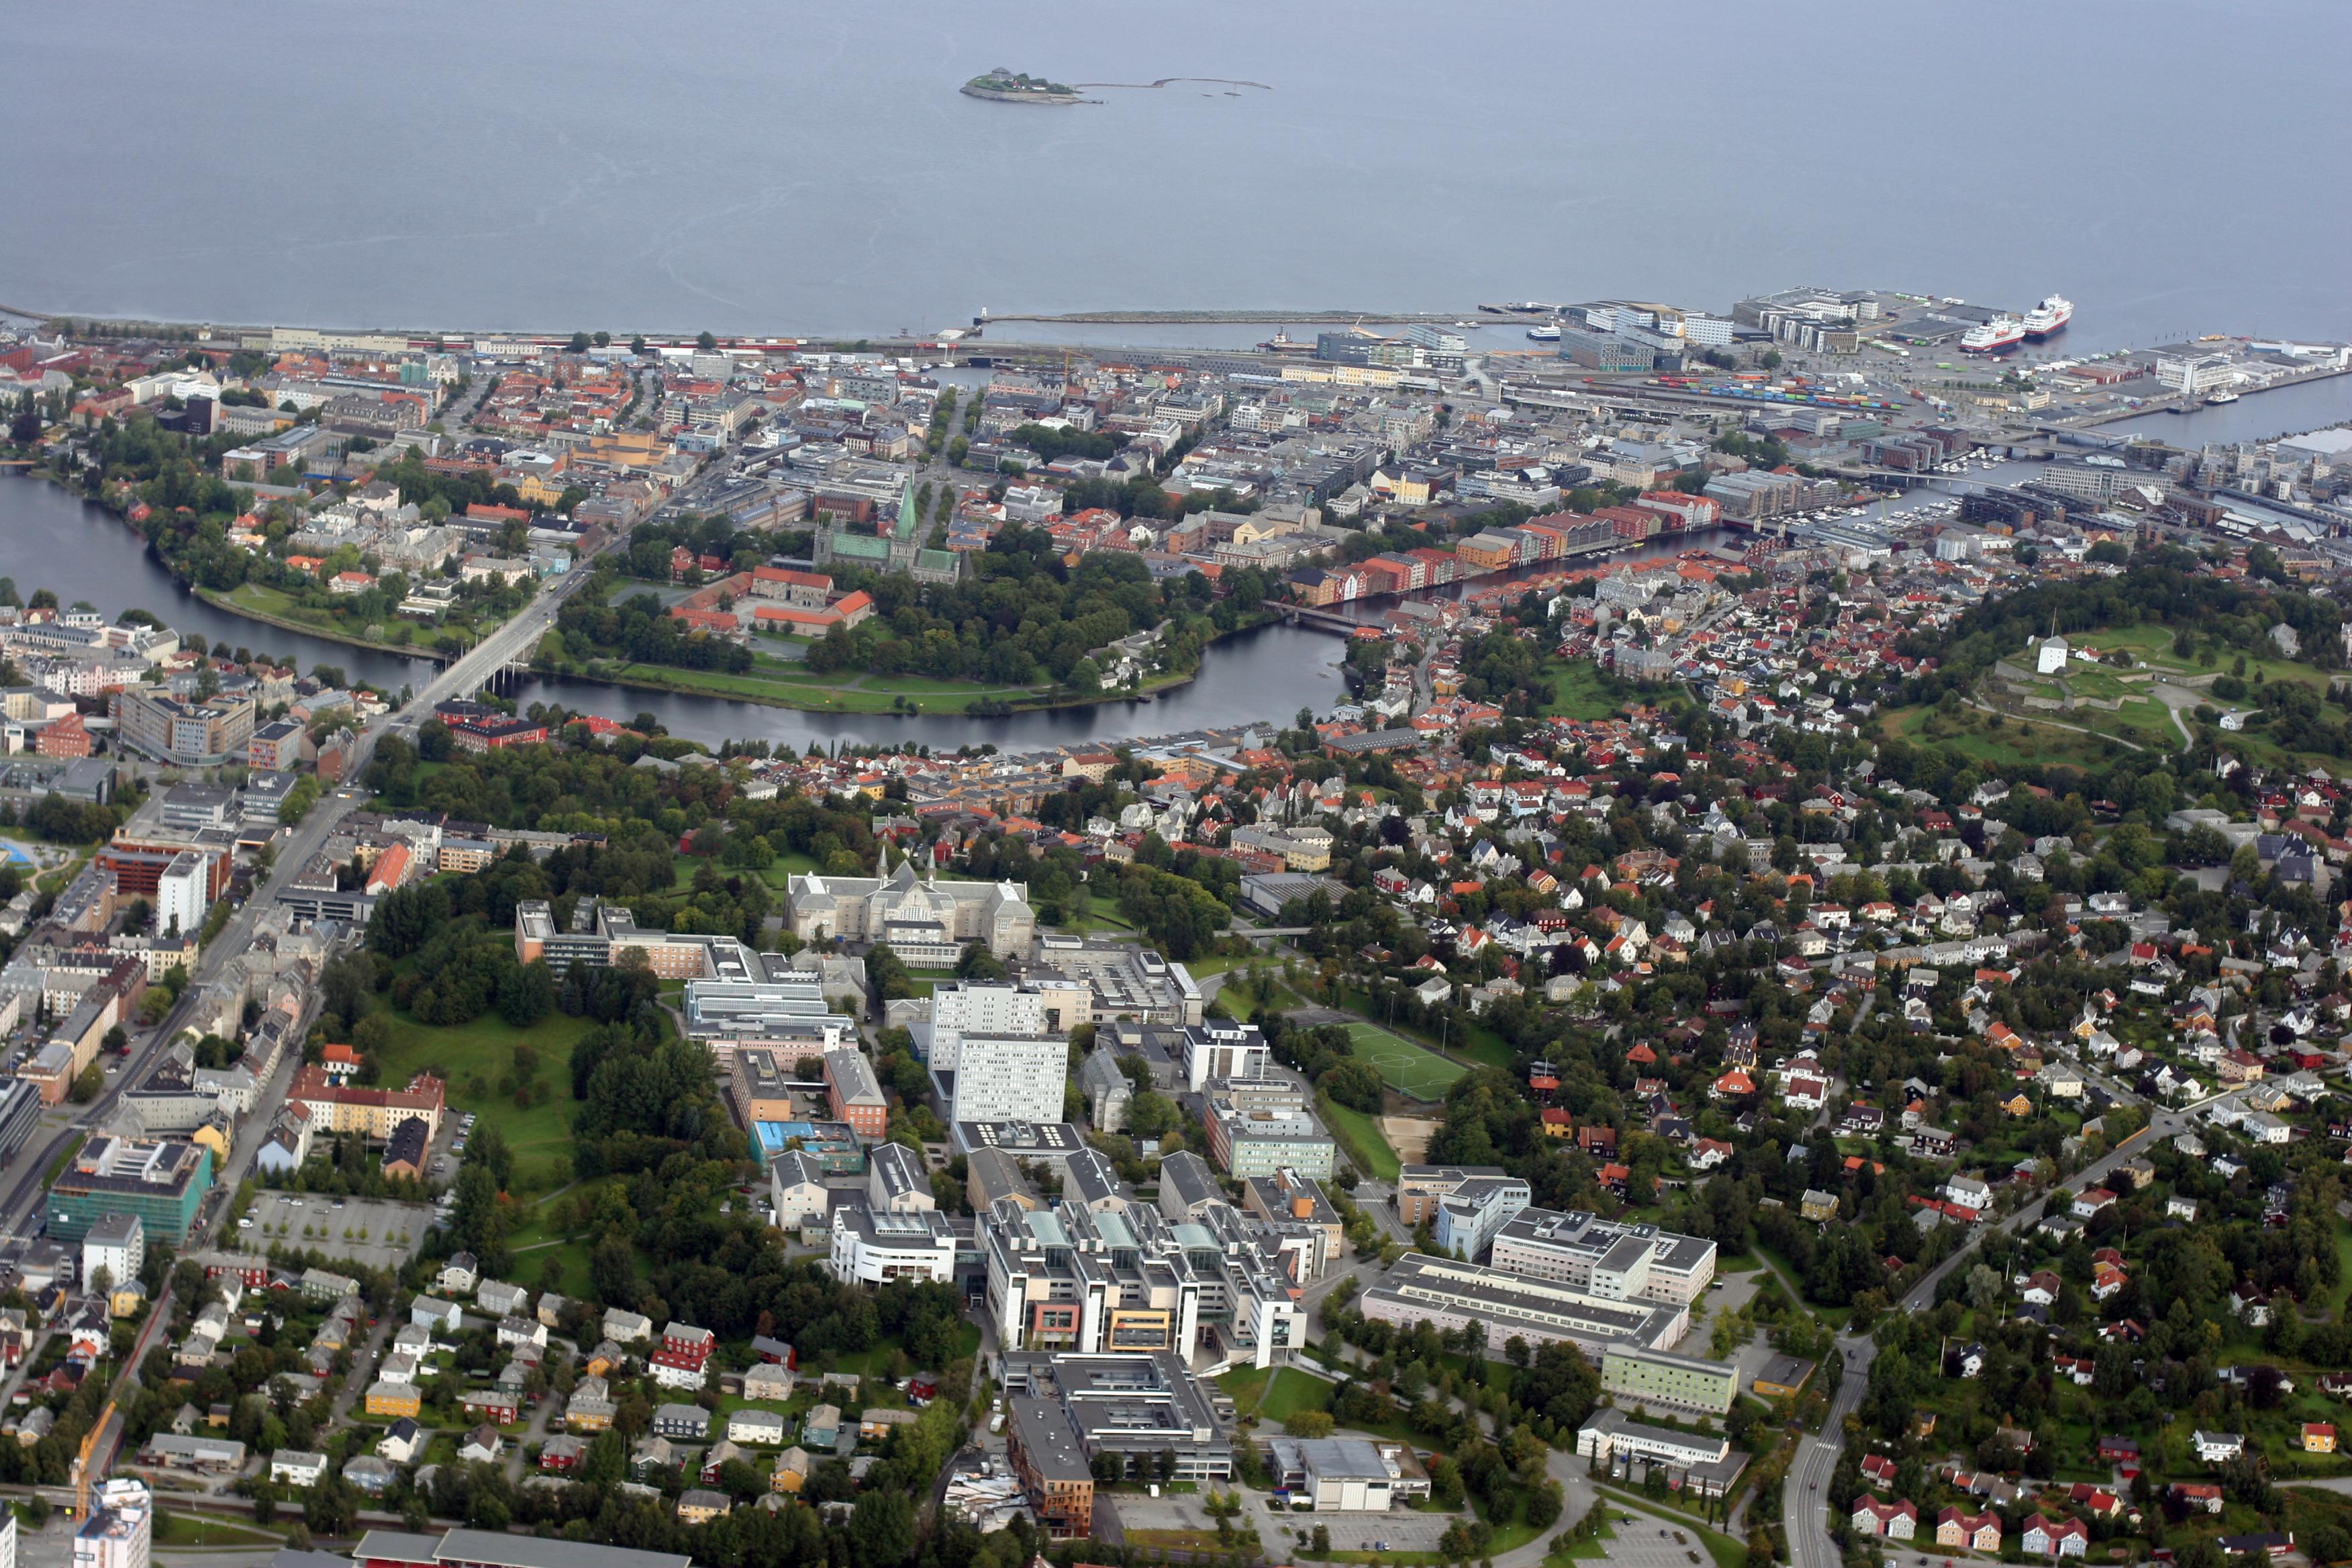 Aerial view of Gløshaugplatået.